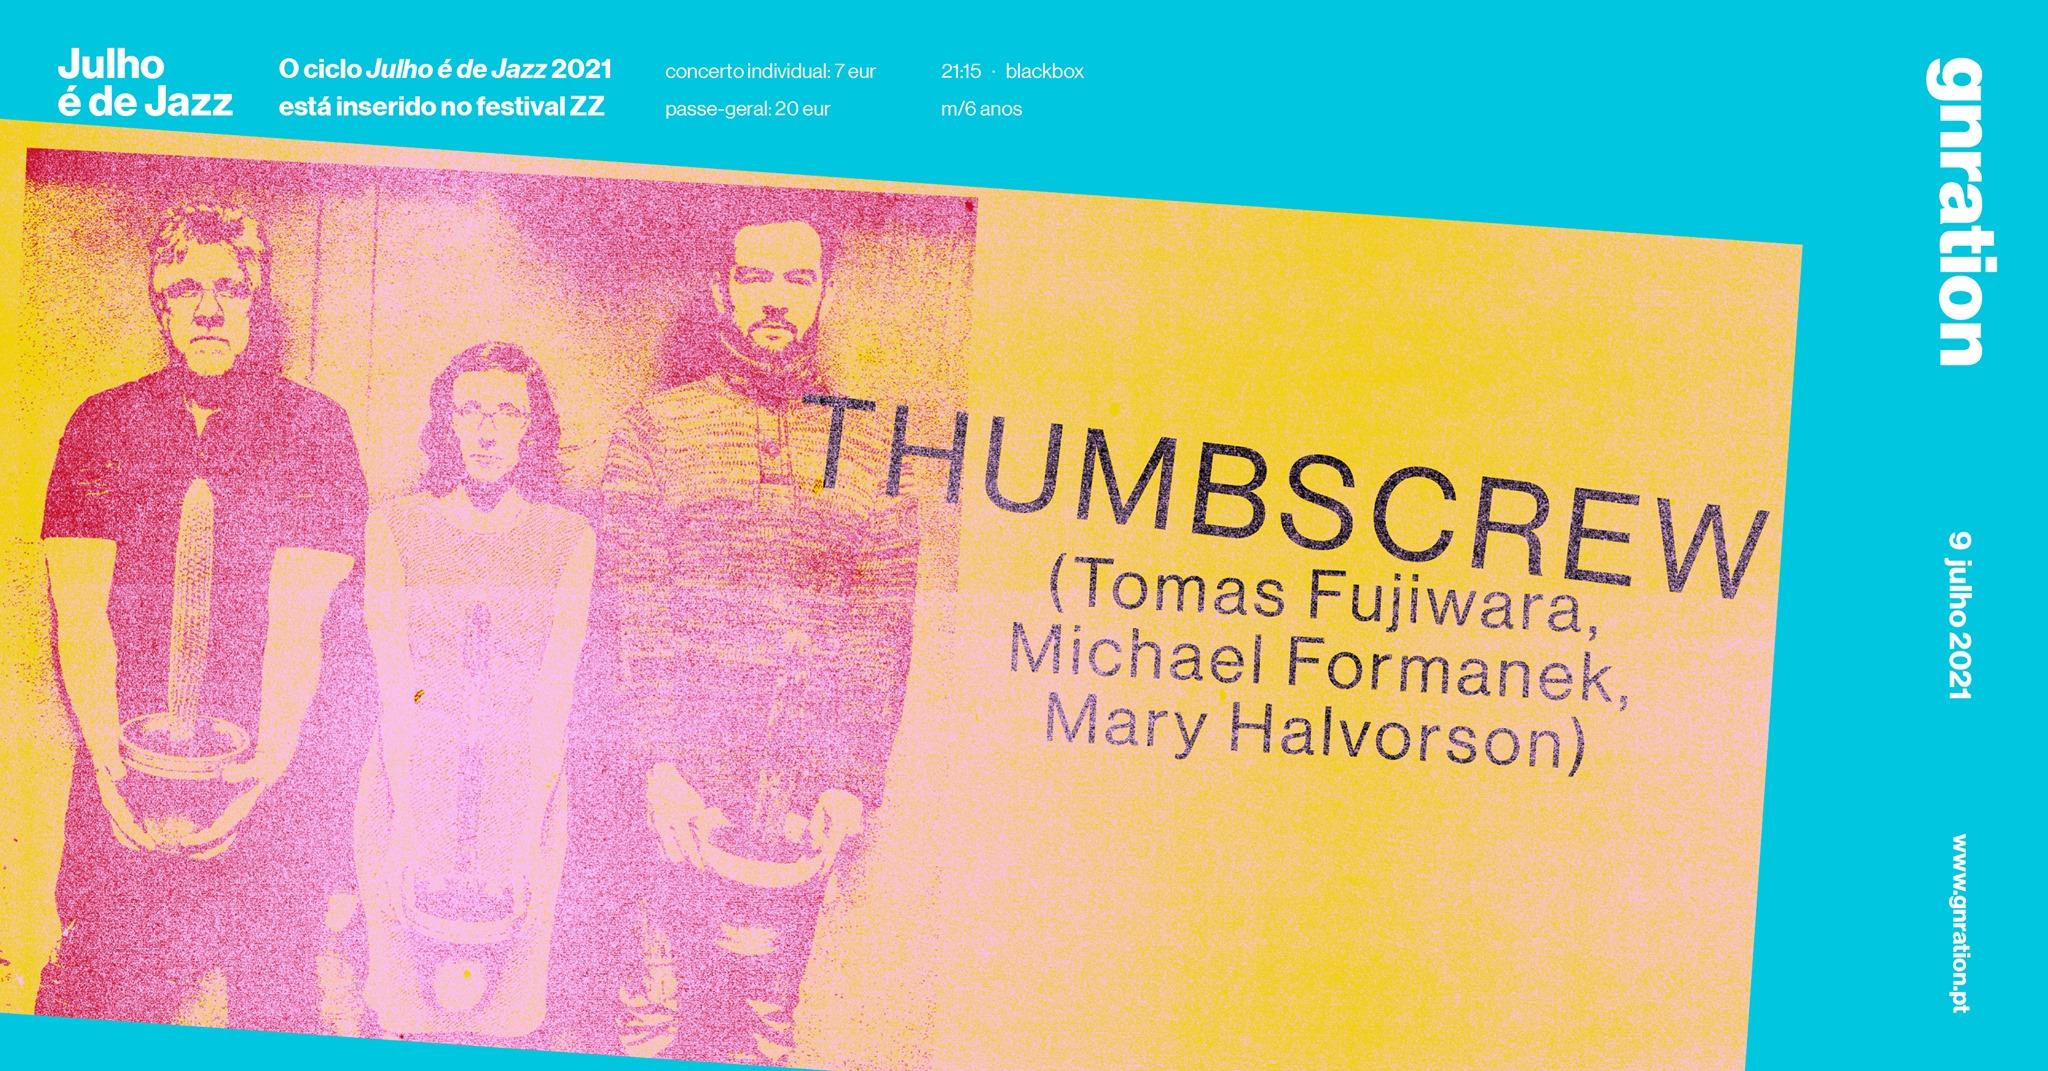 Julho é de Jazz: Thumbscrew (Fujiwara, Formanek, Halvorson) | gnration